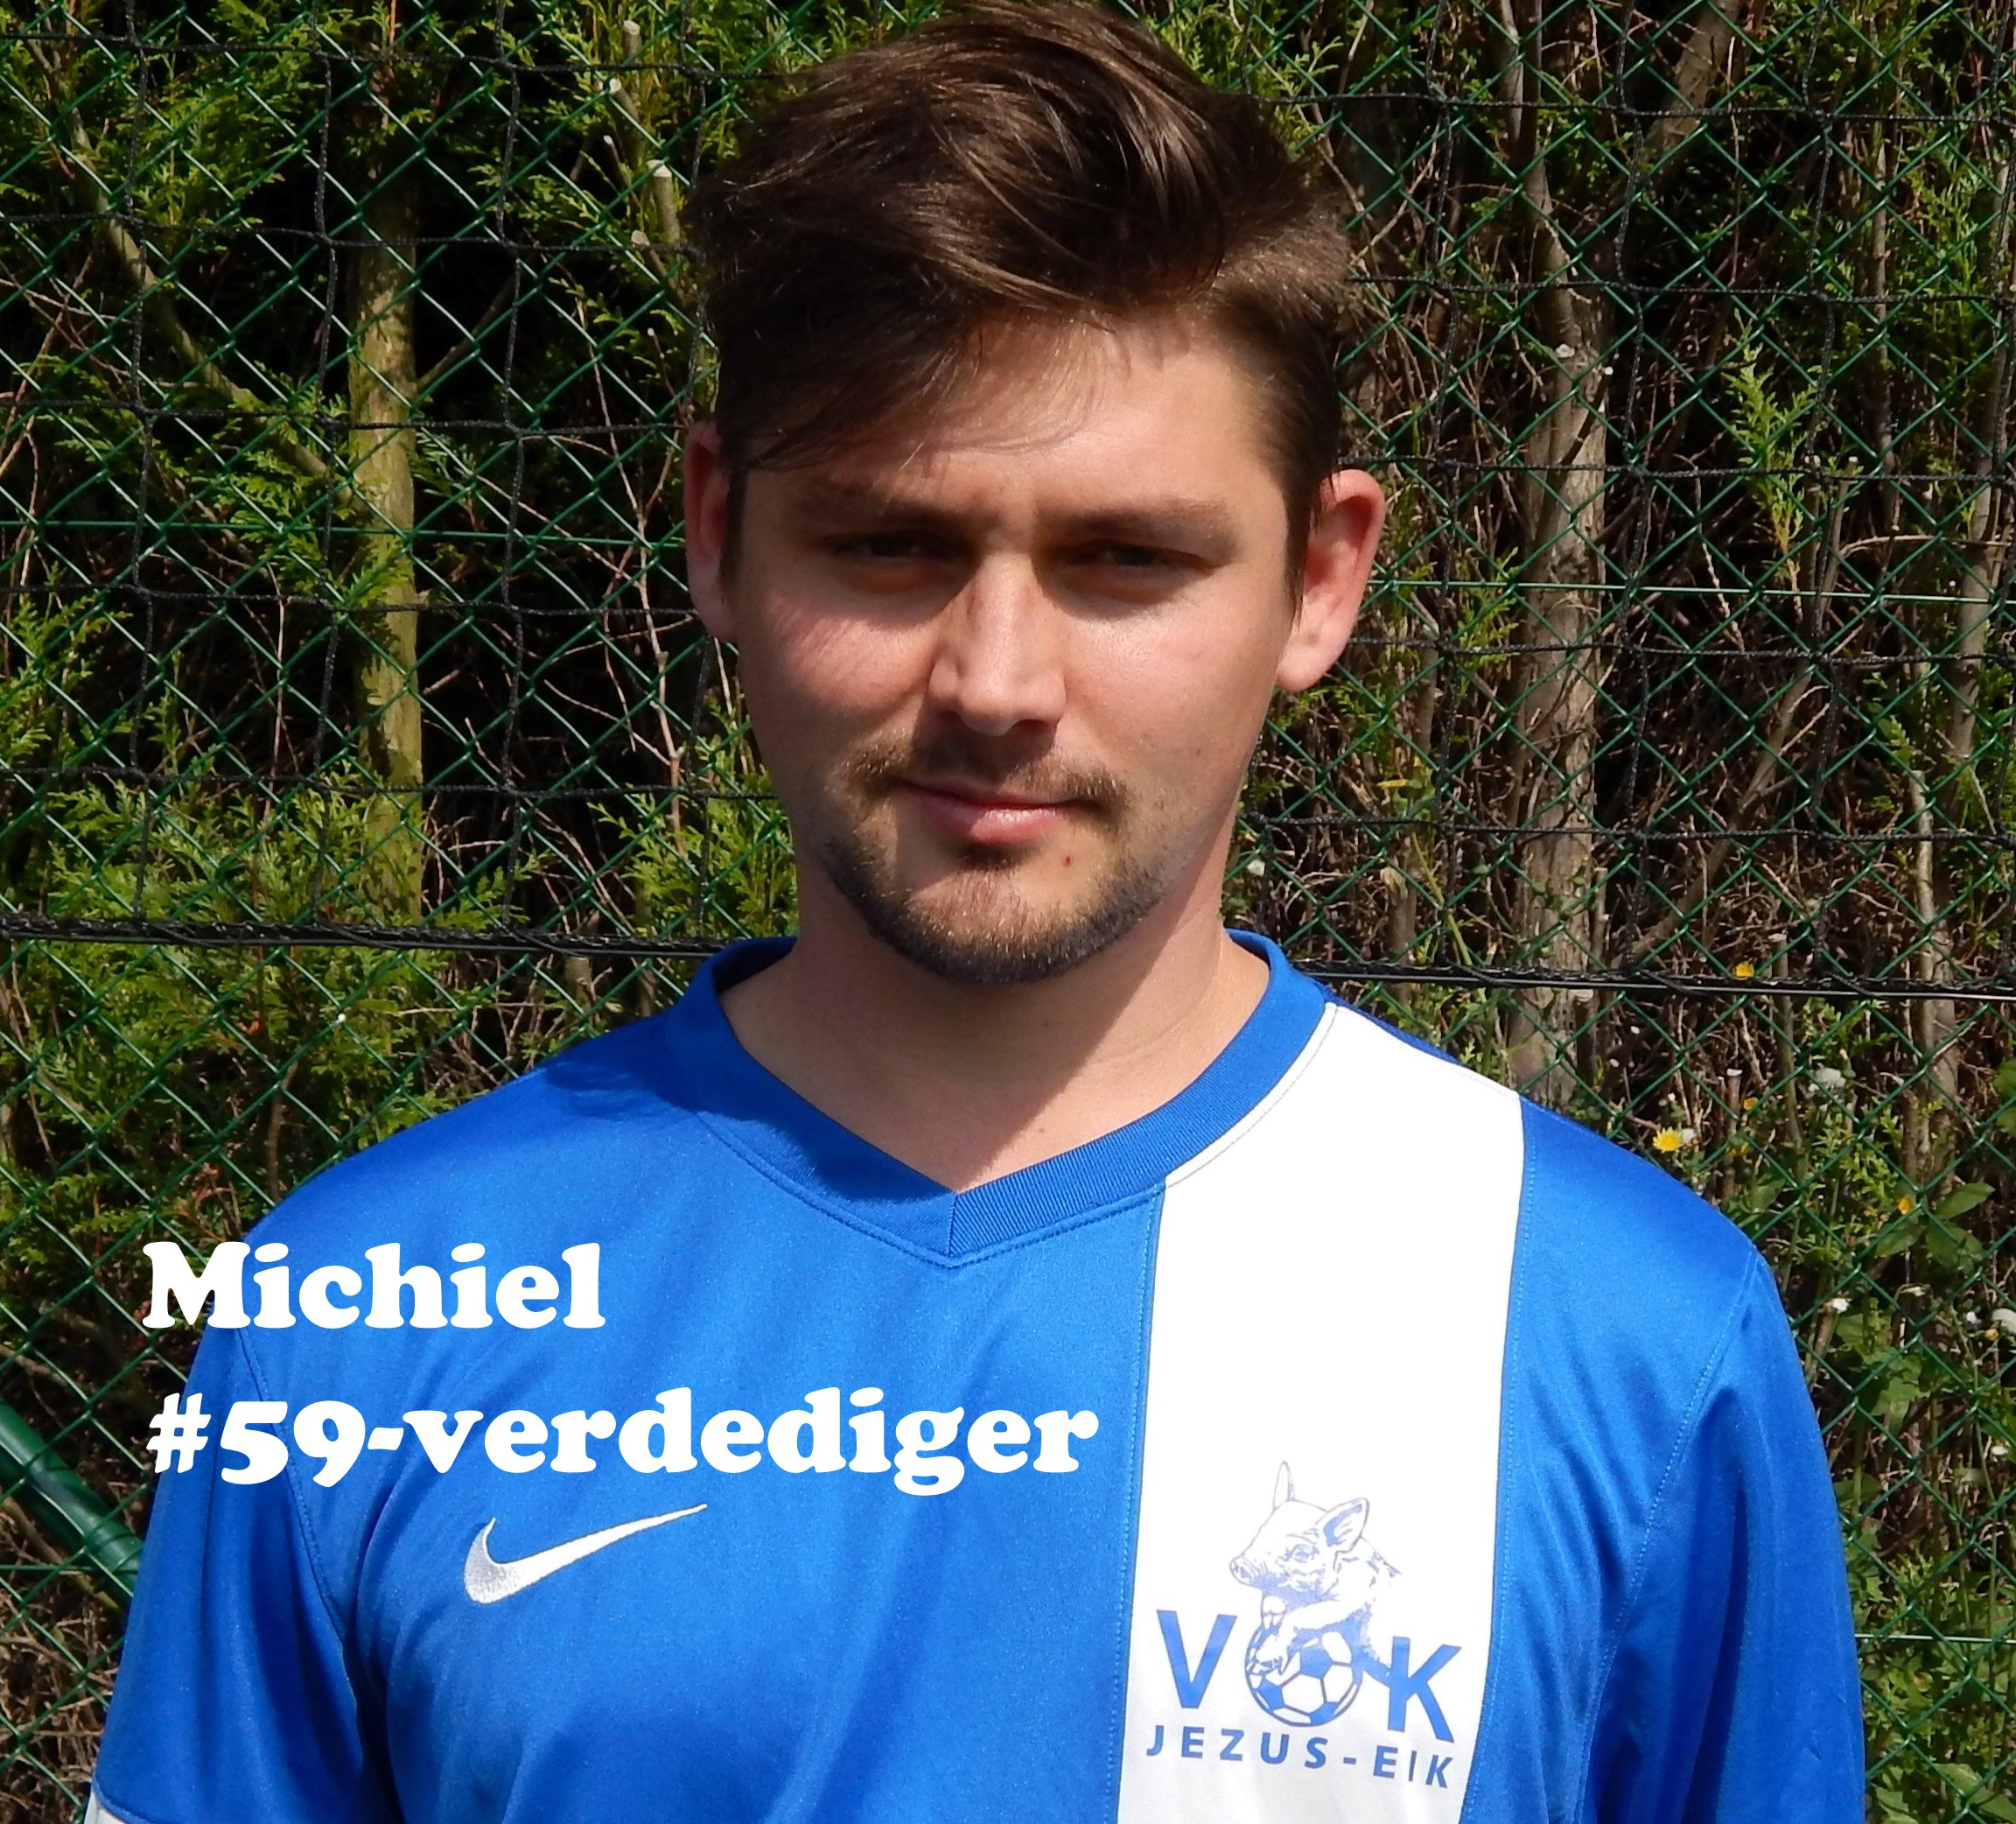 Michiel - Verdediger - 59